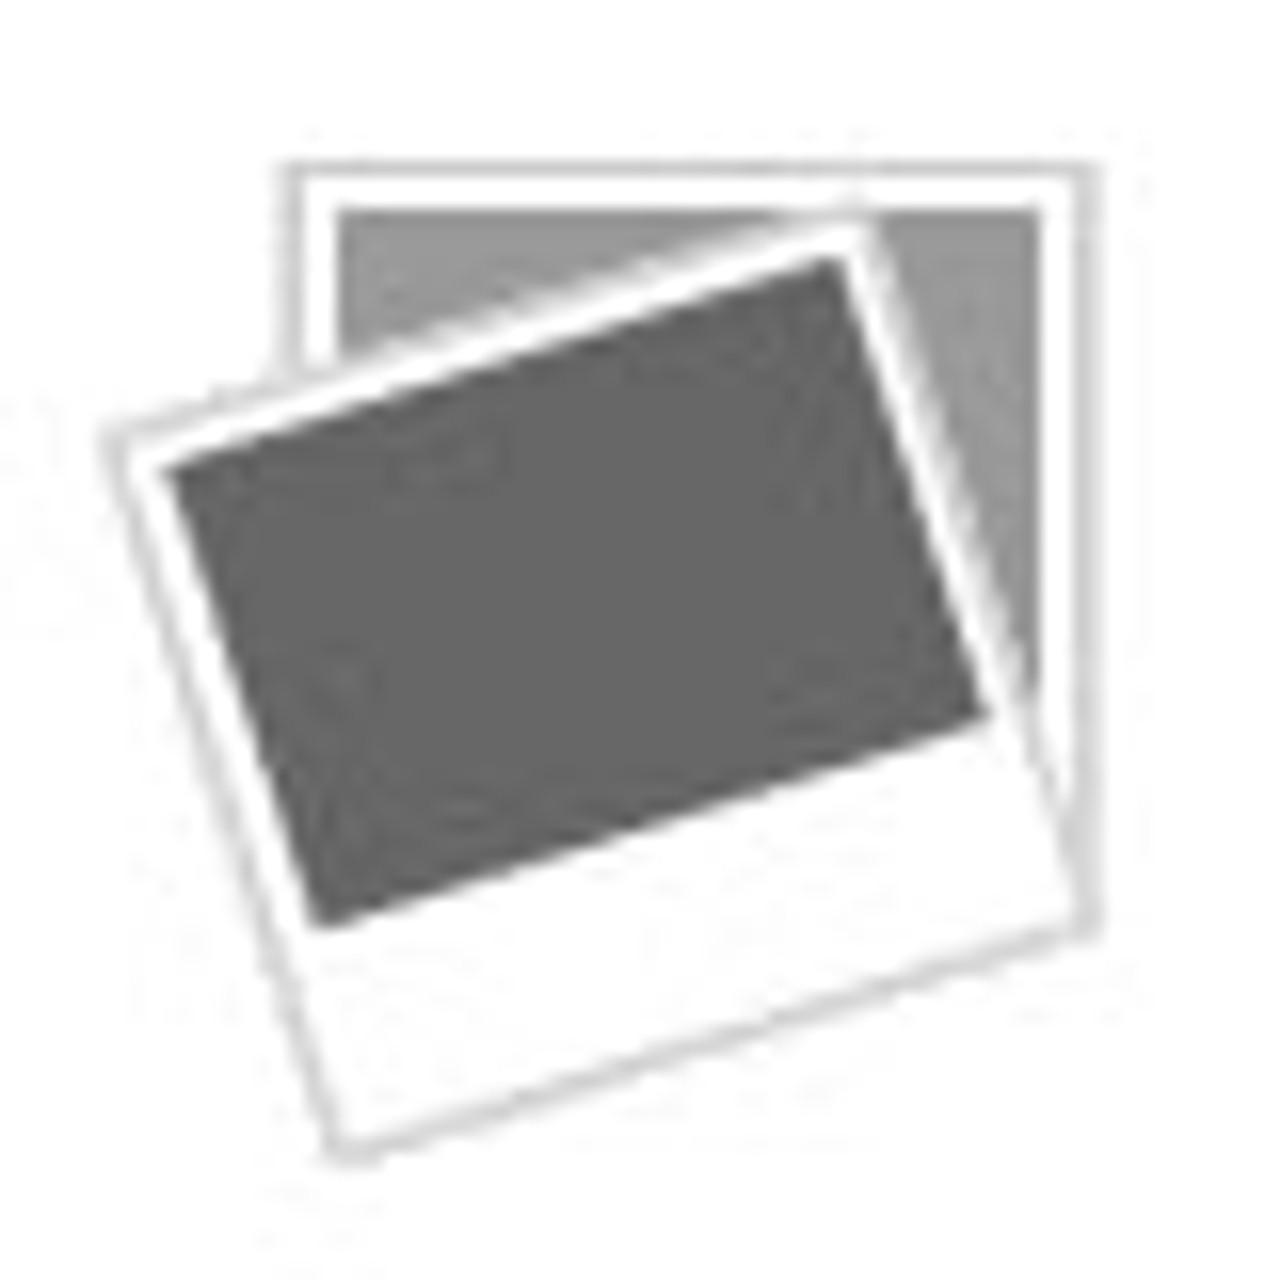 Samsung M393B1K70DH0-YK0 8GB PC3L 12800R 2Rx4 memory dimm